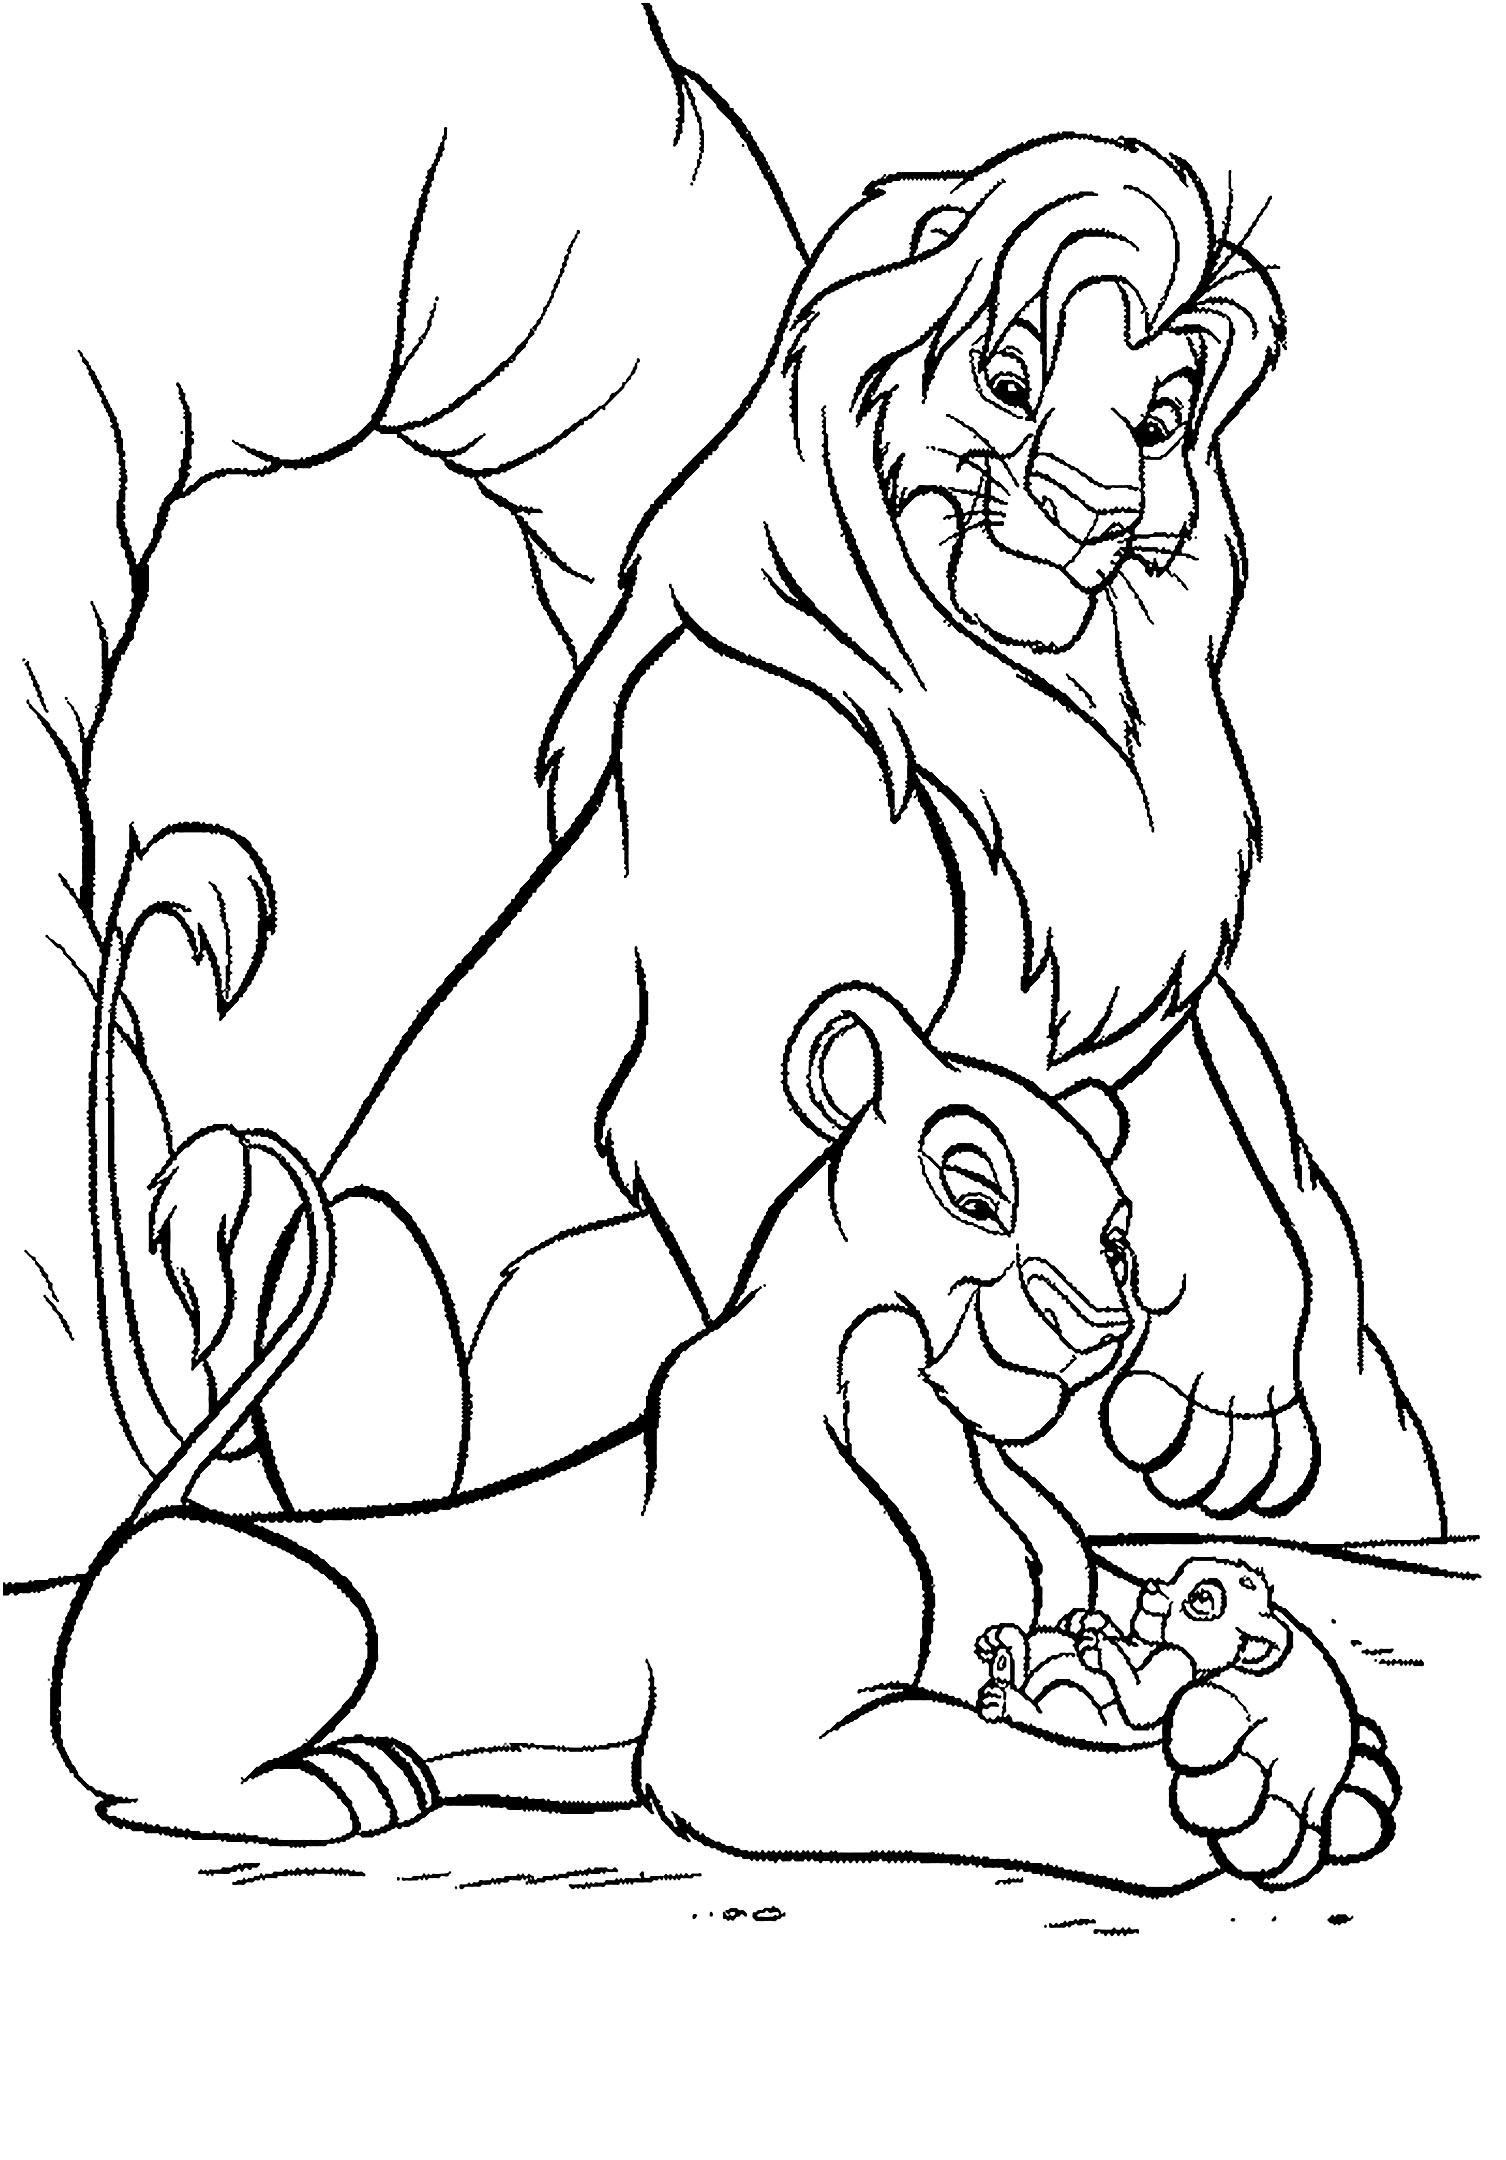 Coloriage du Roi Lion (Disney) avec Nala, Mufasa et Simba